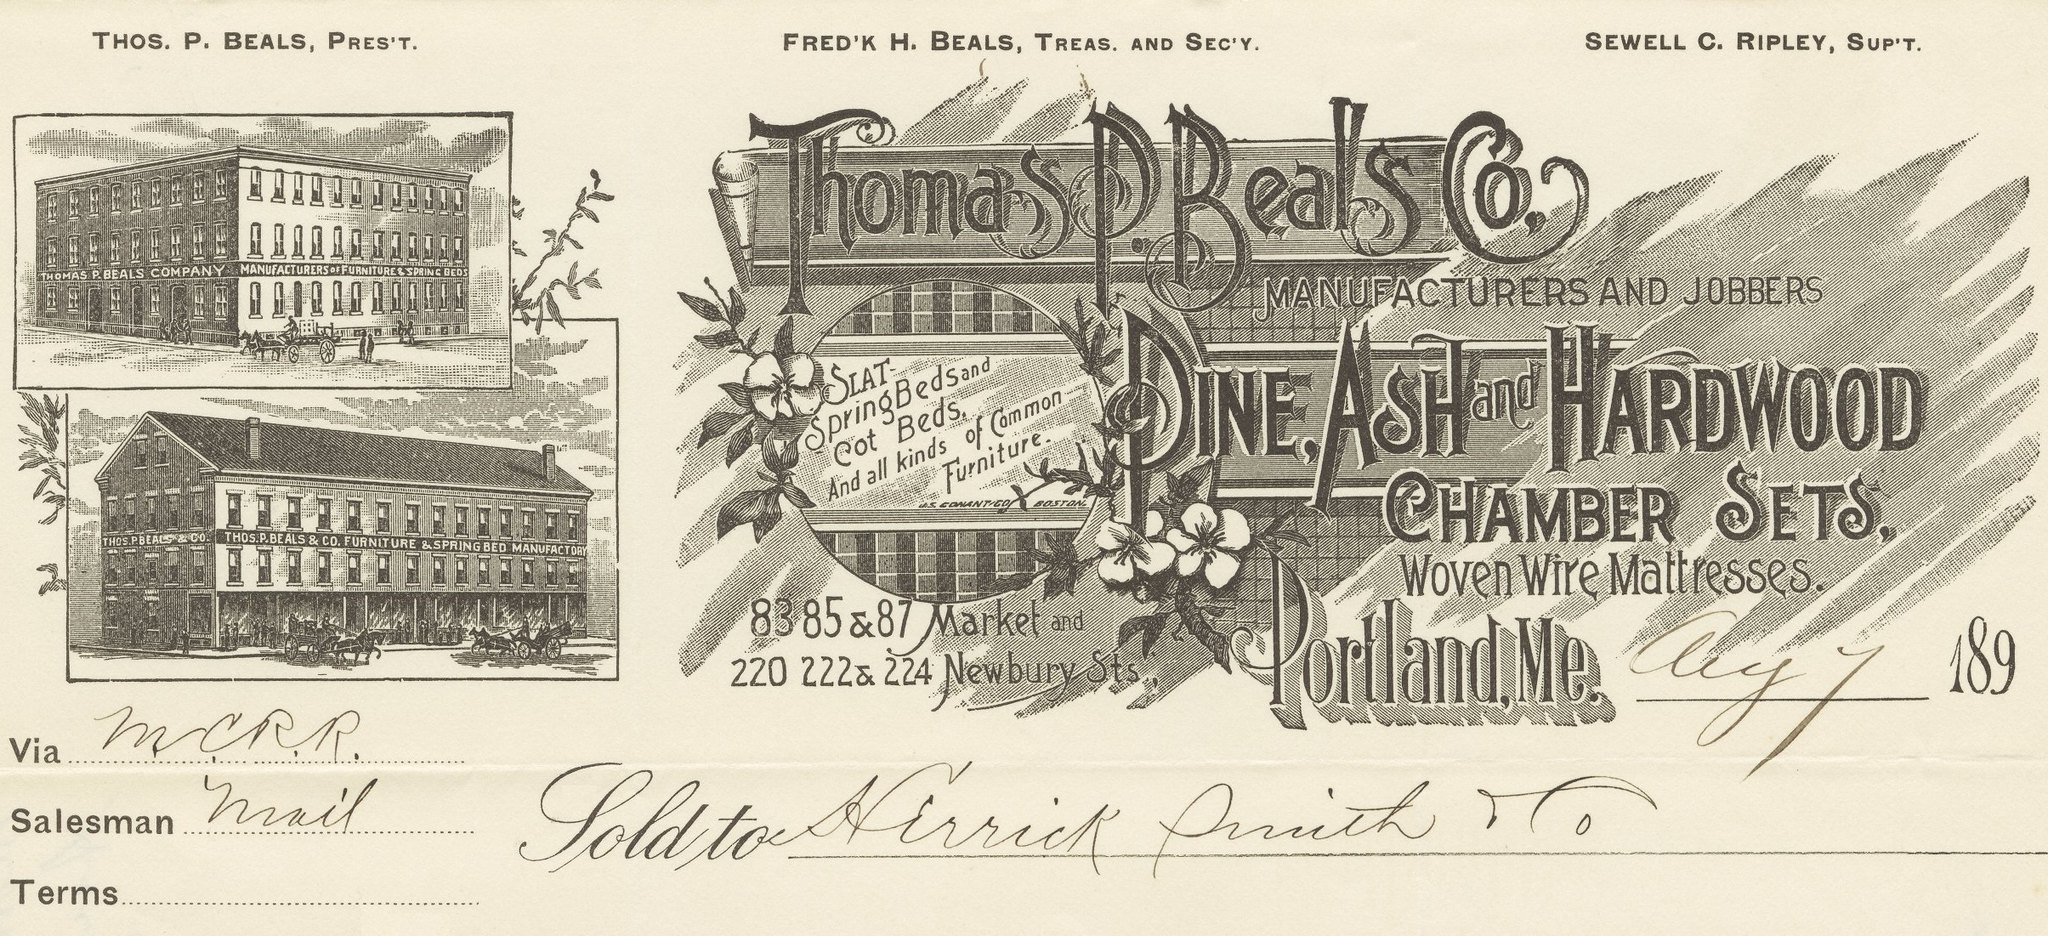 Thomas P. Beals Co. Pine Ash + Hardwood Chamber Sets - Wov ...